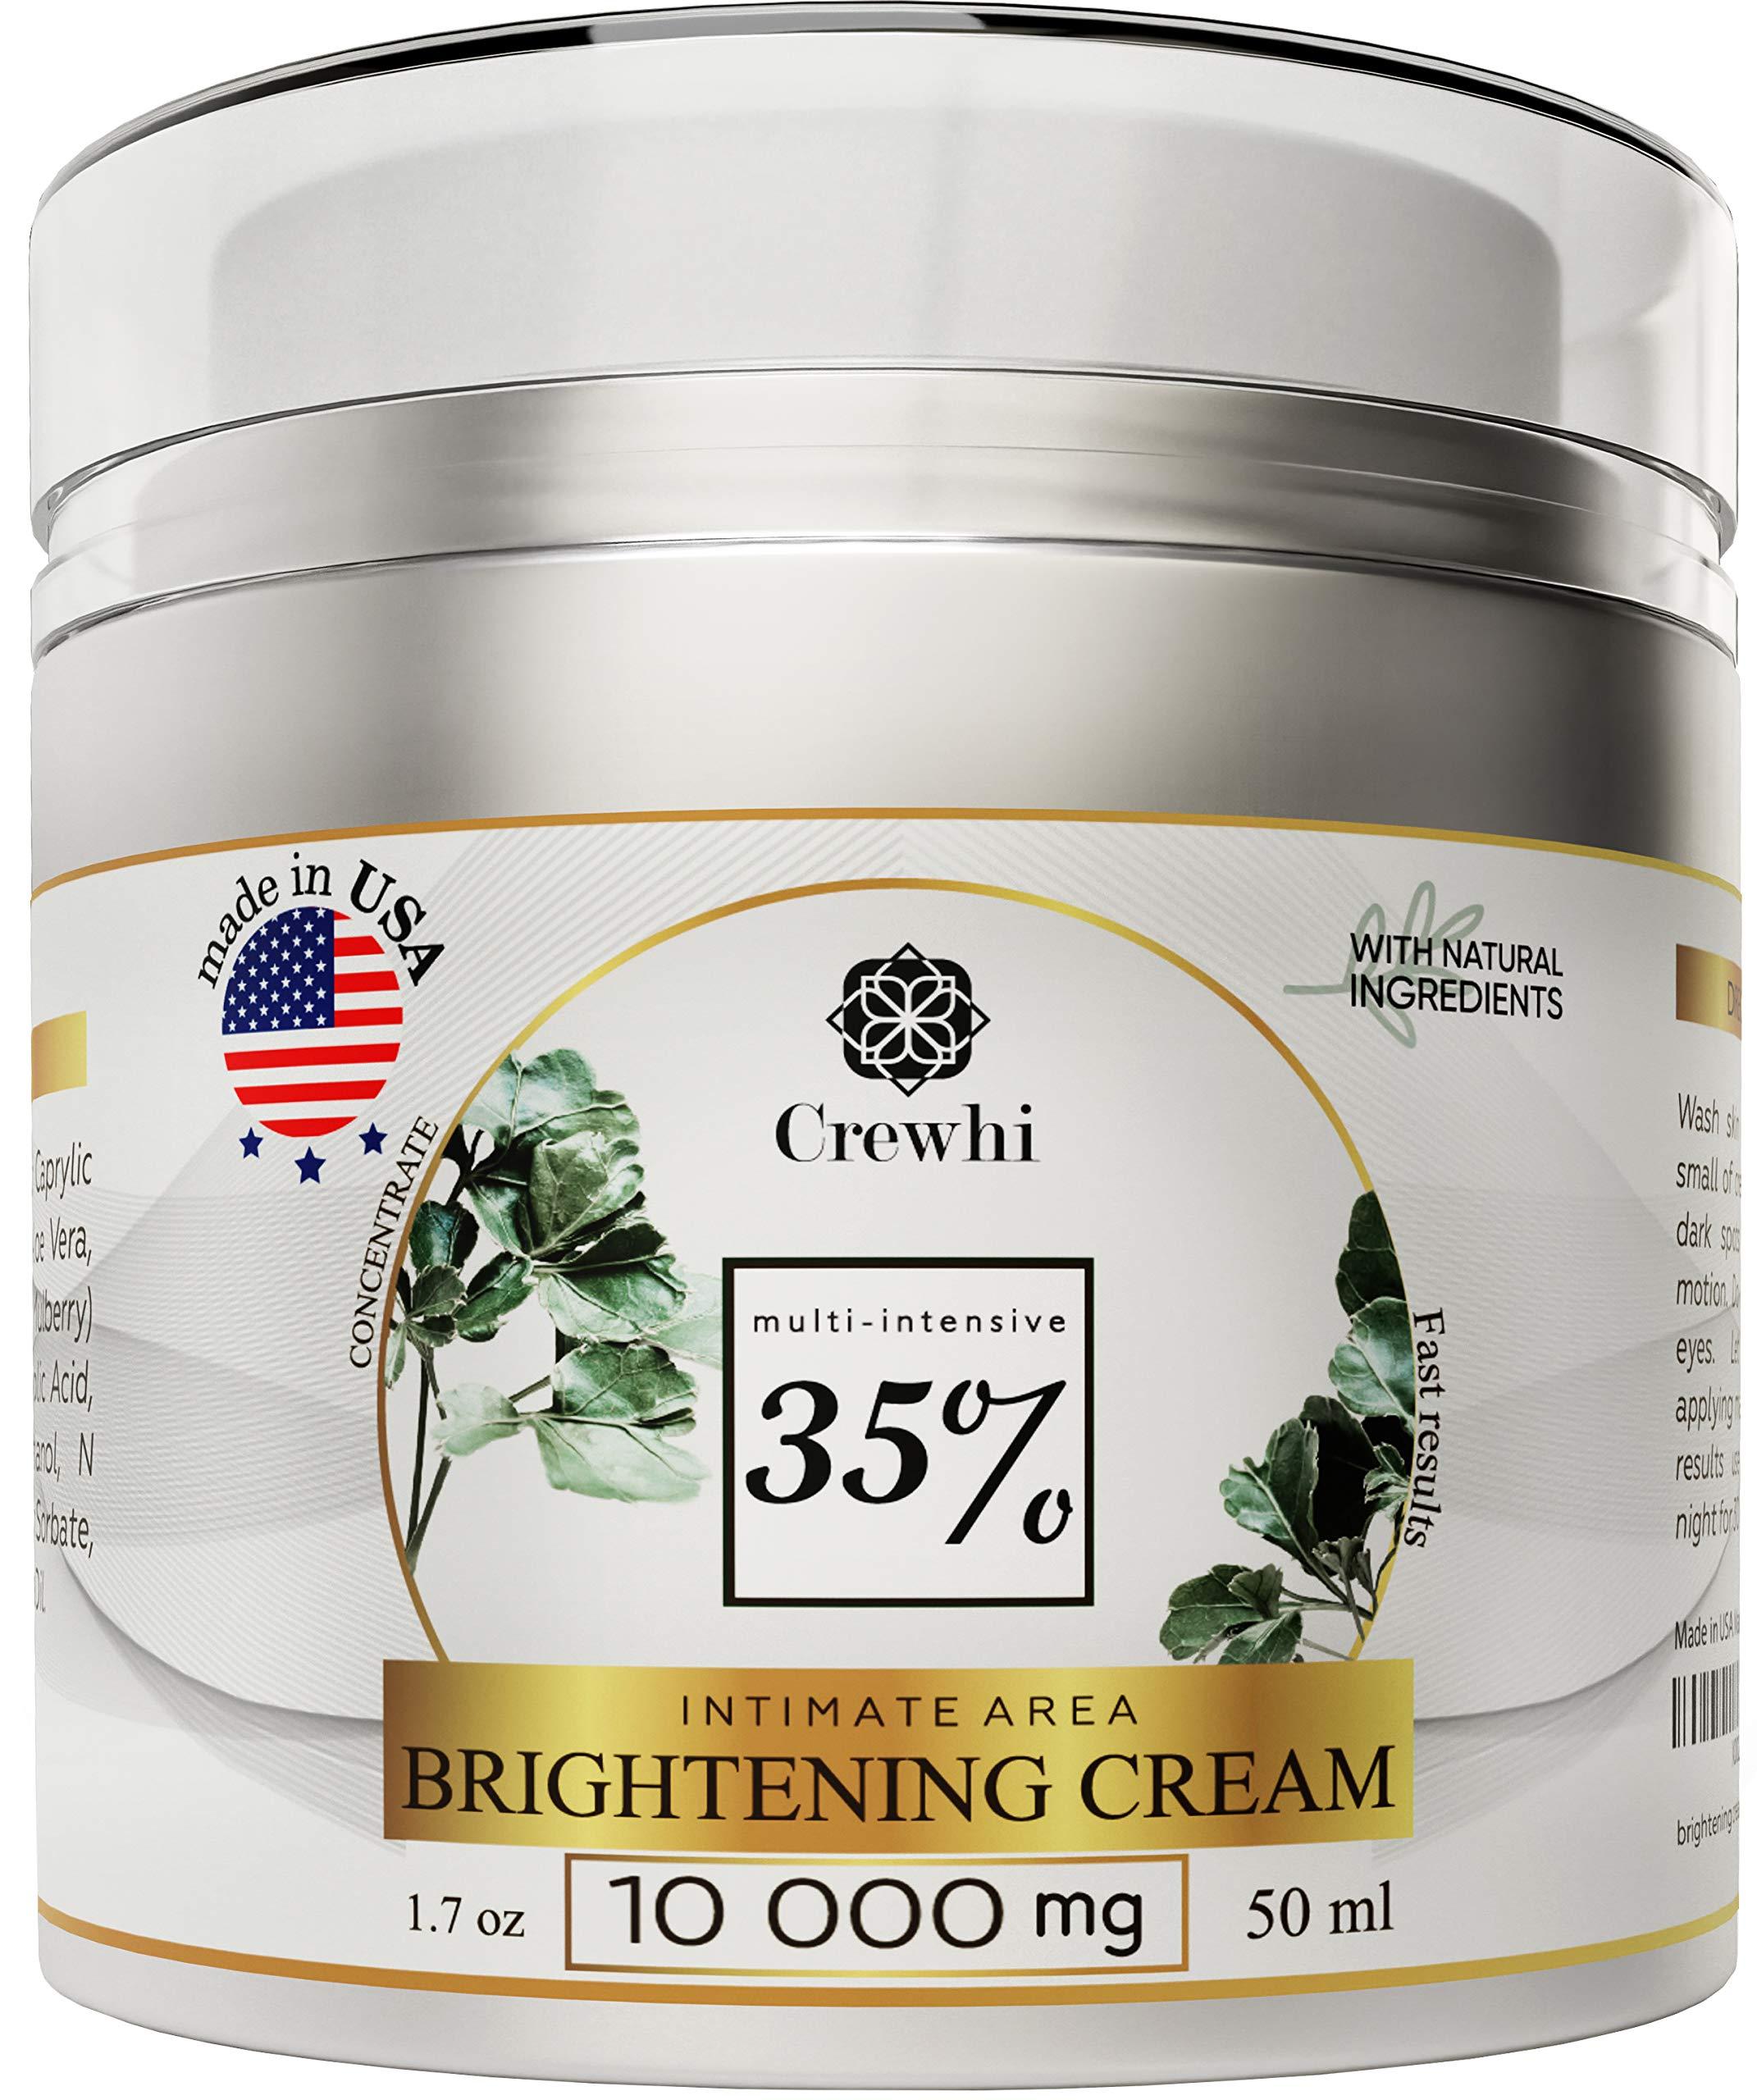 Brightening Skin Cream for Sensitive Areas Dark Spot Corrector - Dark Spot removal for Men and Women - Bright Gel for Face, Bikini - Skin Care & Natural Product - 35% percent